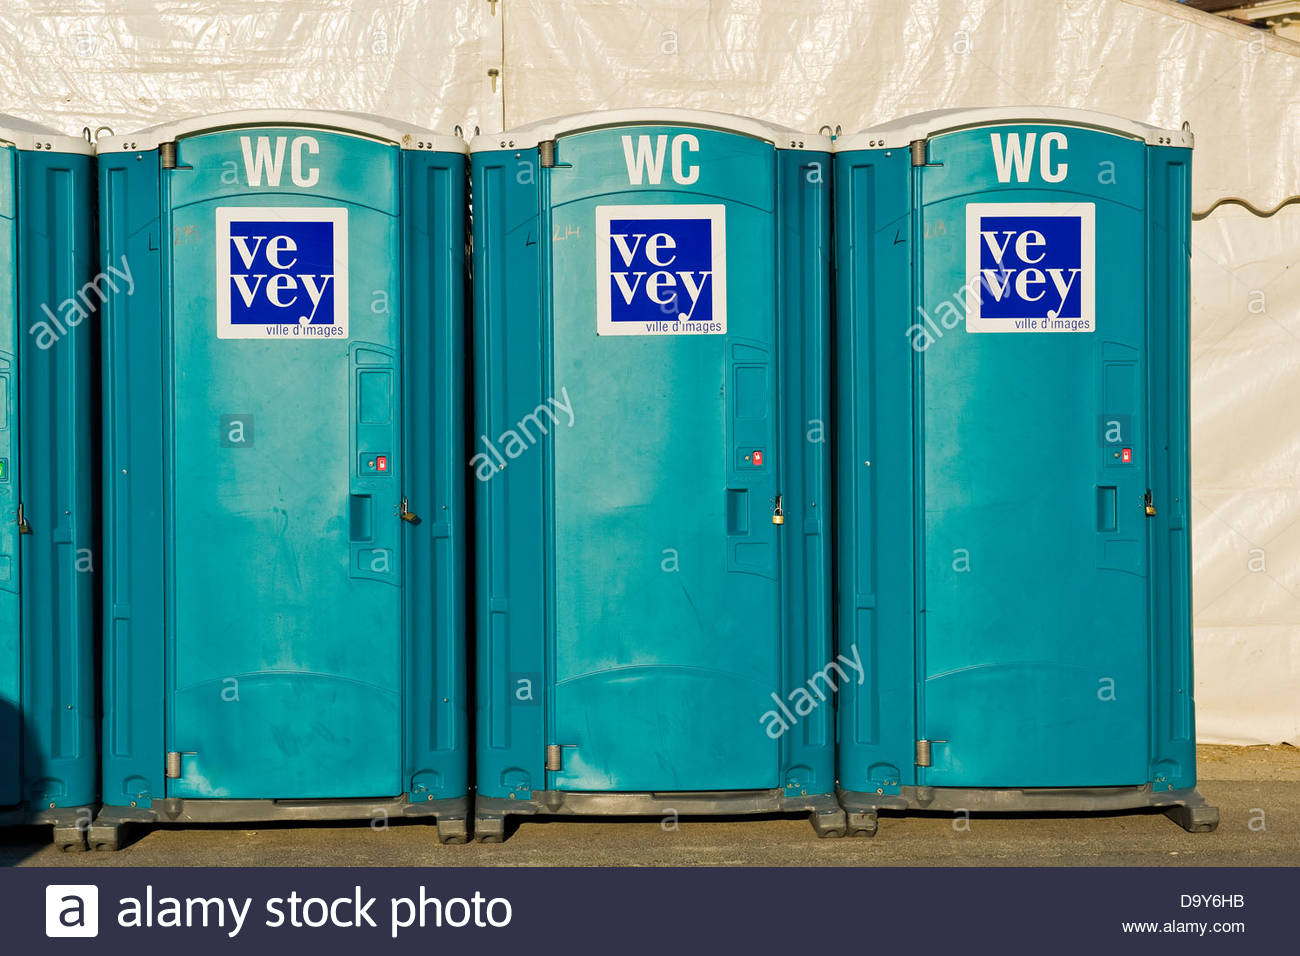 Toilette,Vevey,Switzerland - Stock Image